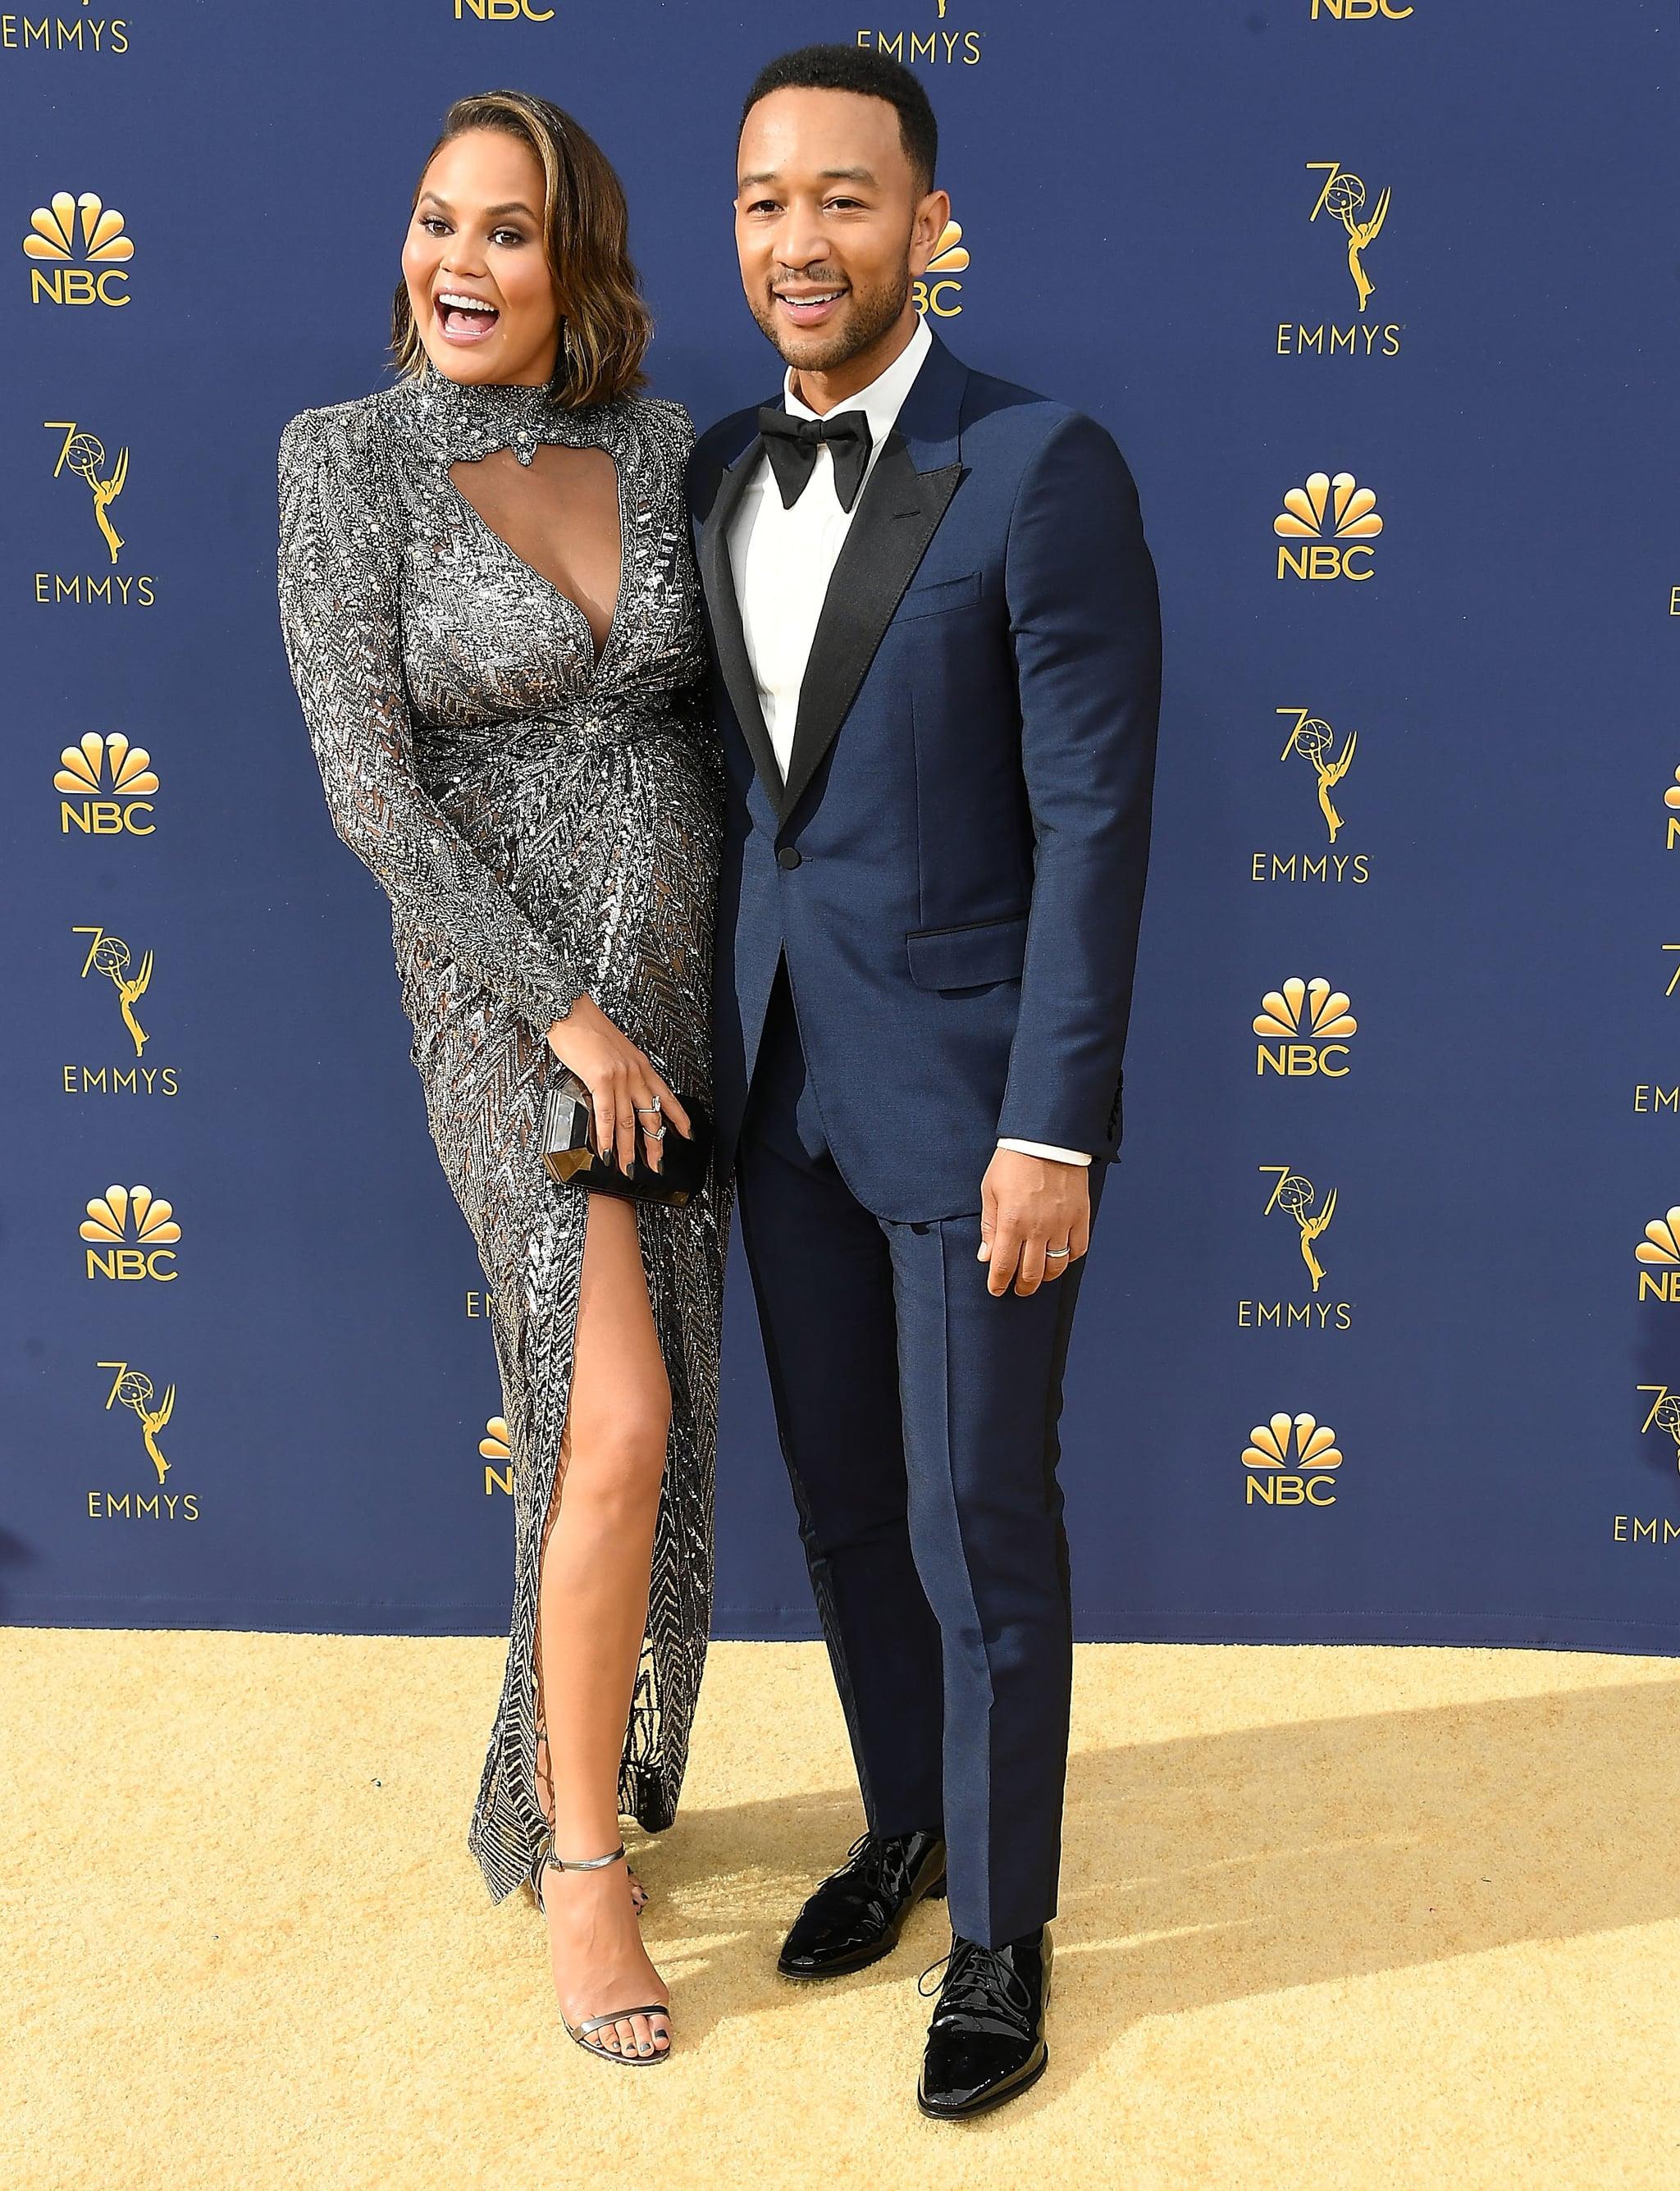 LOS ANGELES, CA - SEPTEMBER 17:  John Legend, Chrissy Teigen arrives at the 70th Emmy Awards on September 17, 2018 in Los Angeles, California.  (Photo by Steve Granitz/WireImage,)